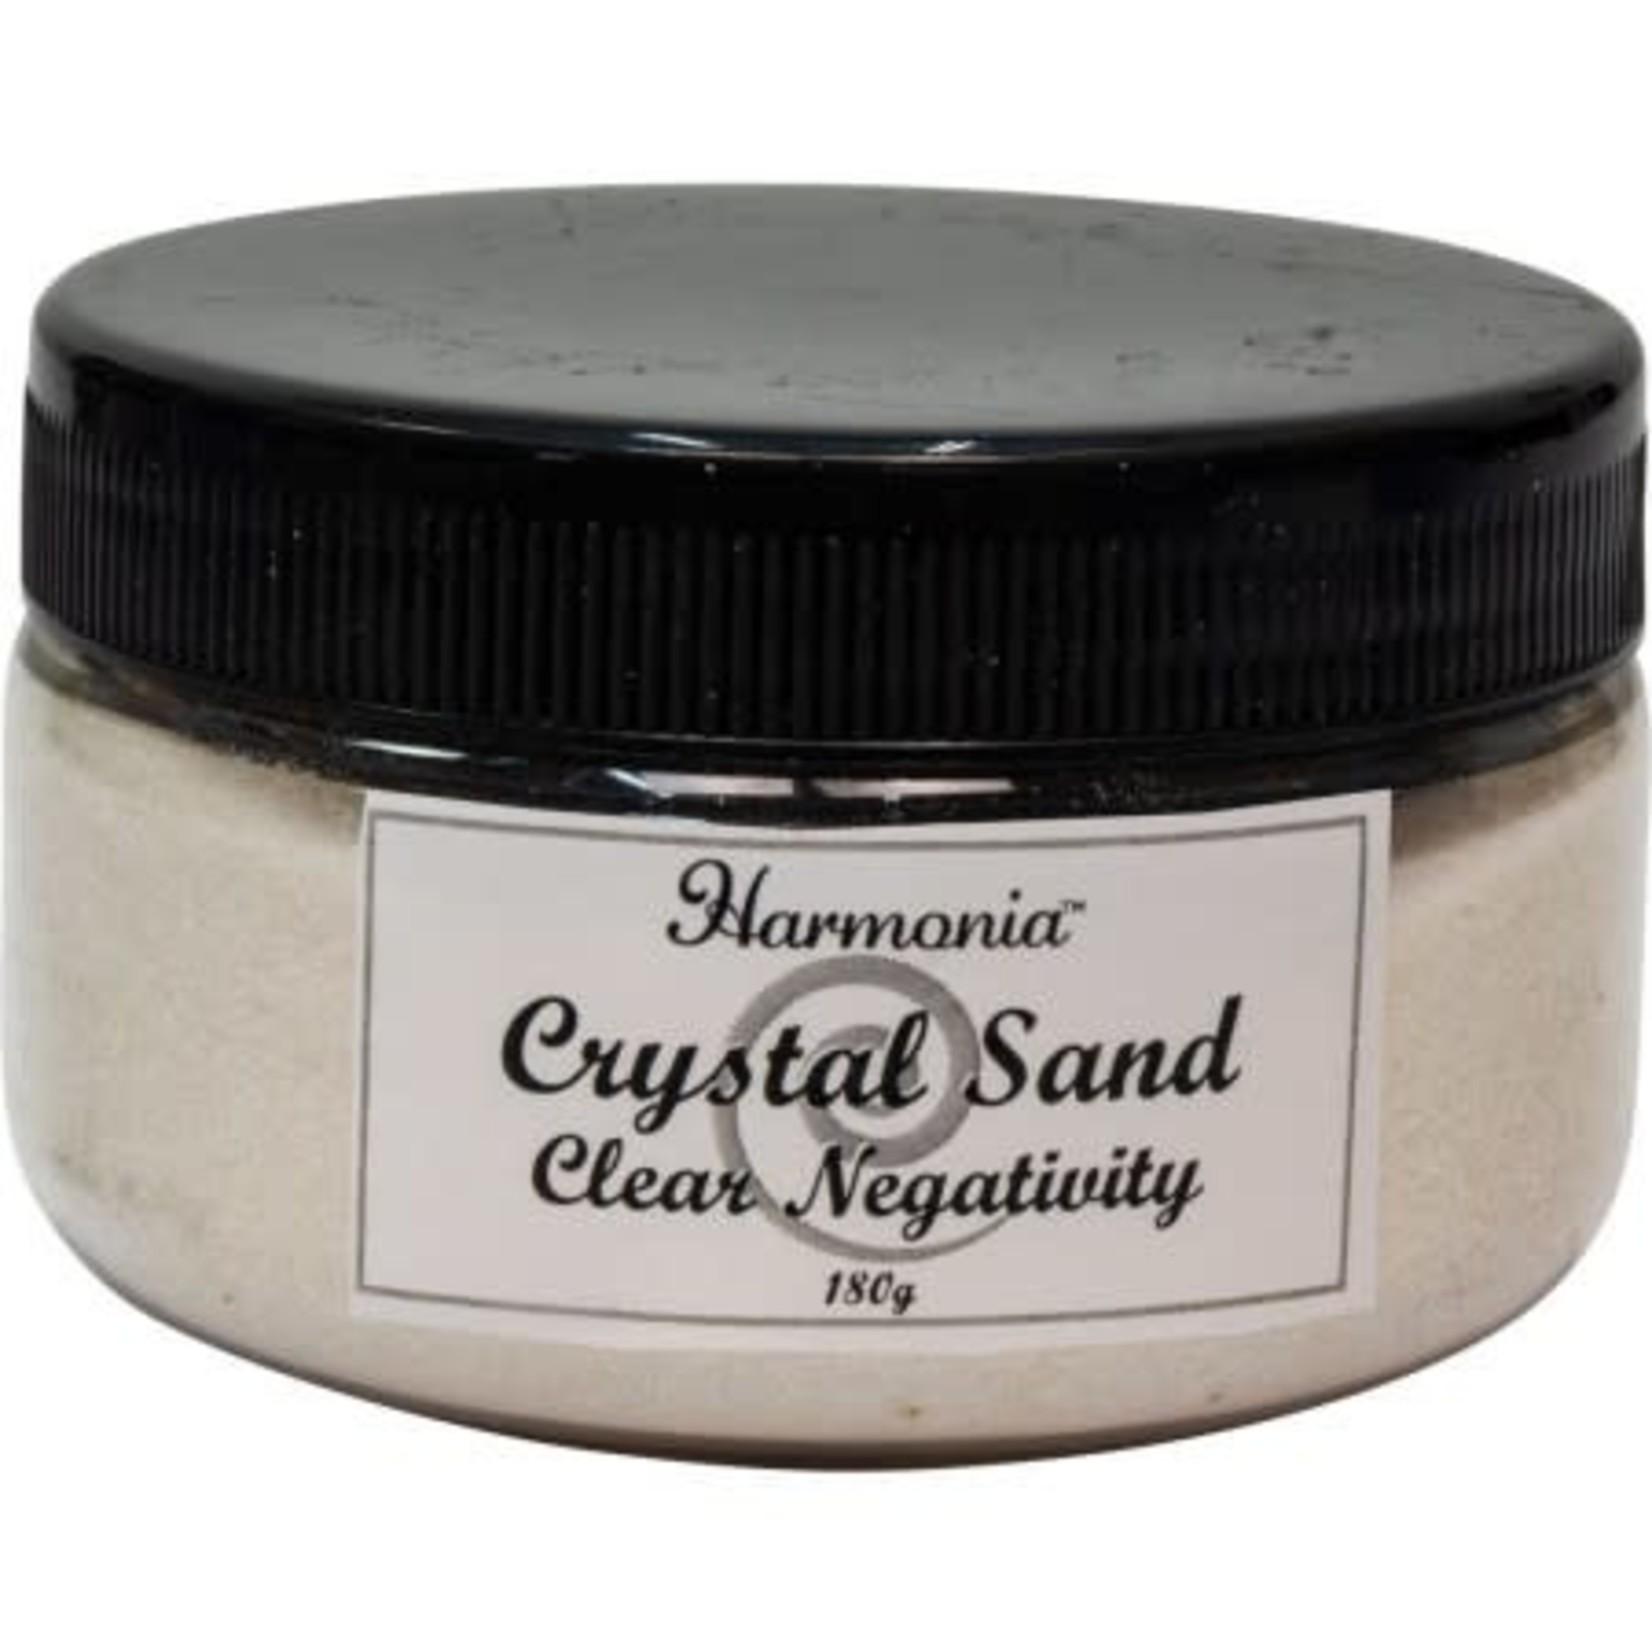 Crystal Sand Clear Quartz - Clear Negativity 180G